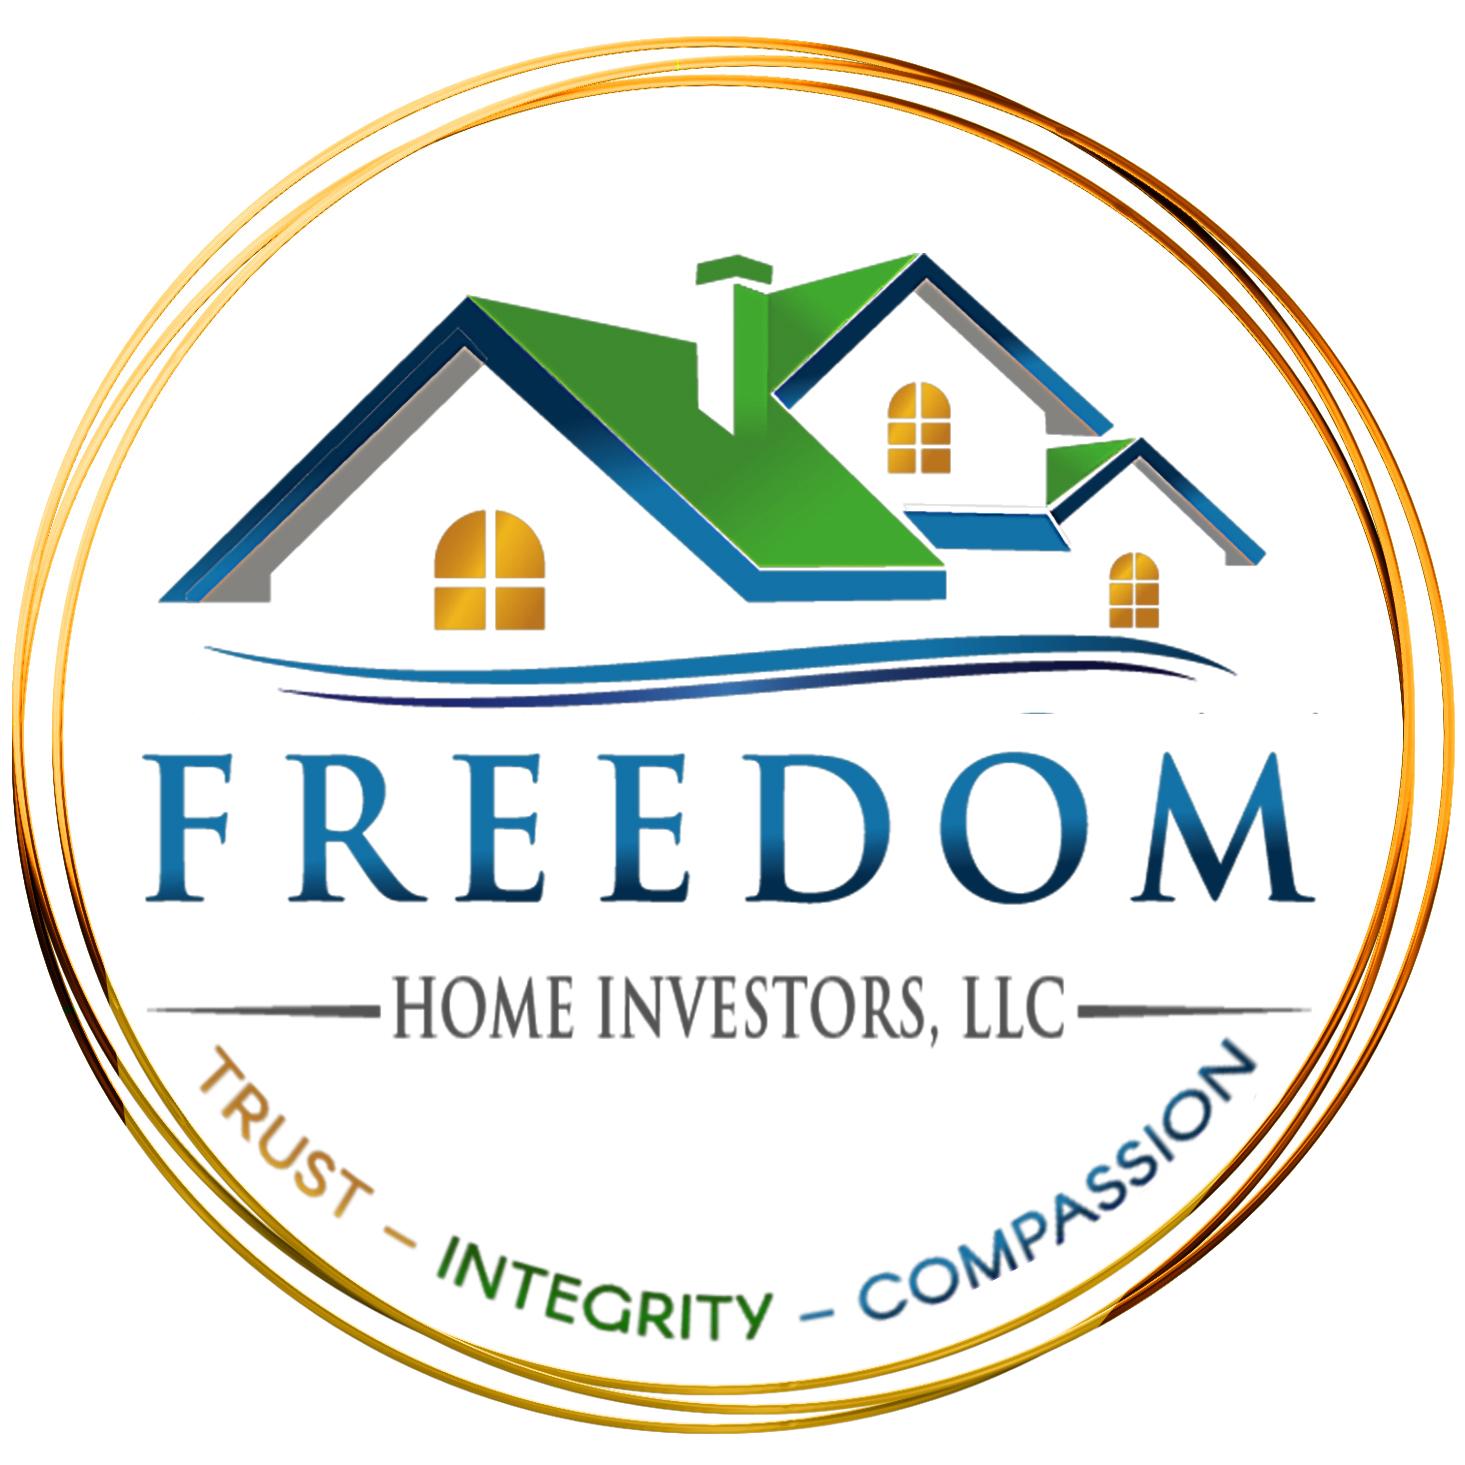 JCA Freedom Home Investors, LLC logo